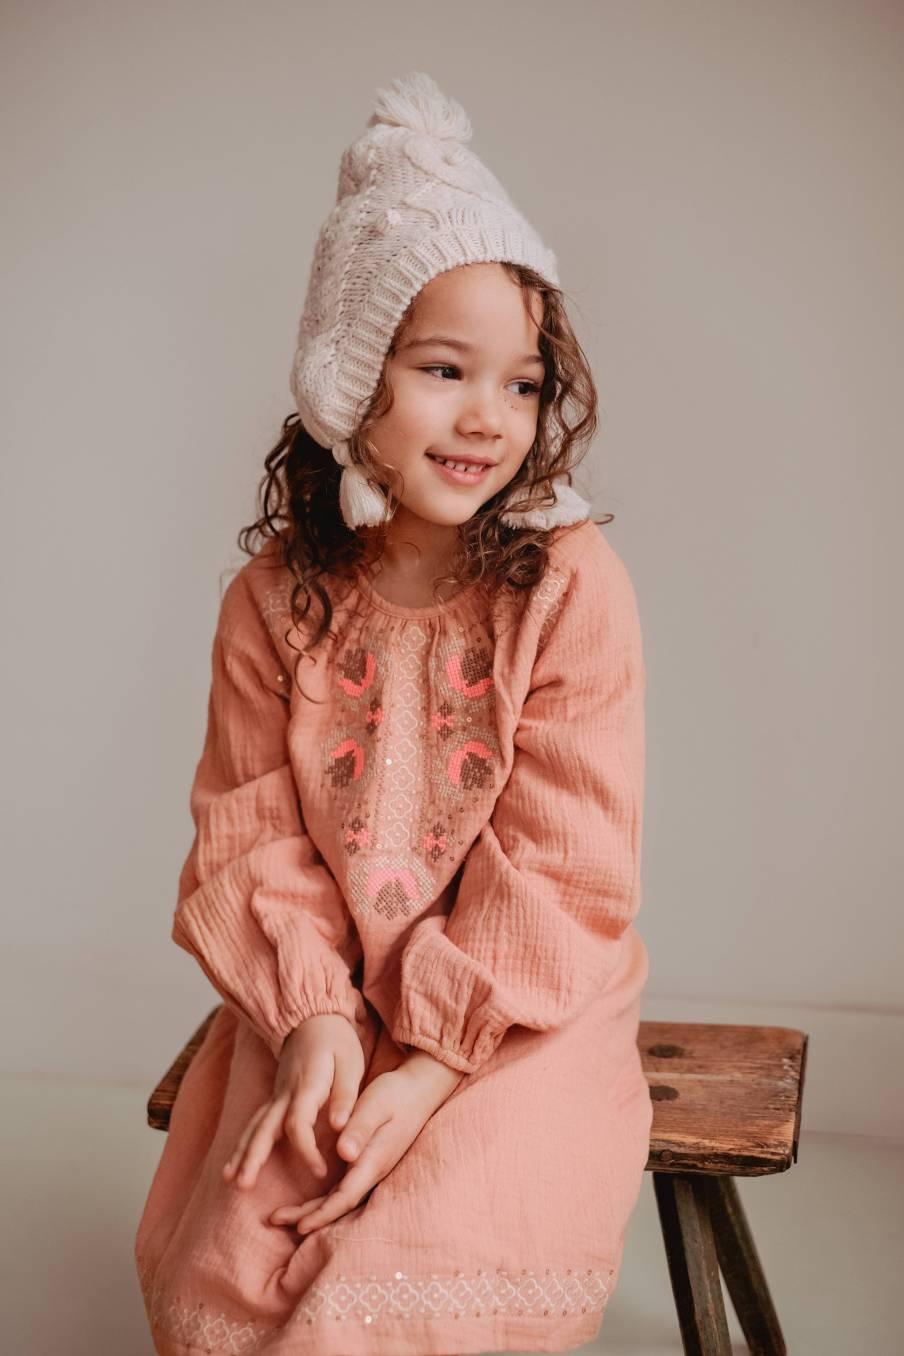 boheme chic vintage robe bébé fille livia sienna